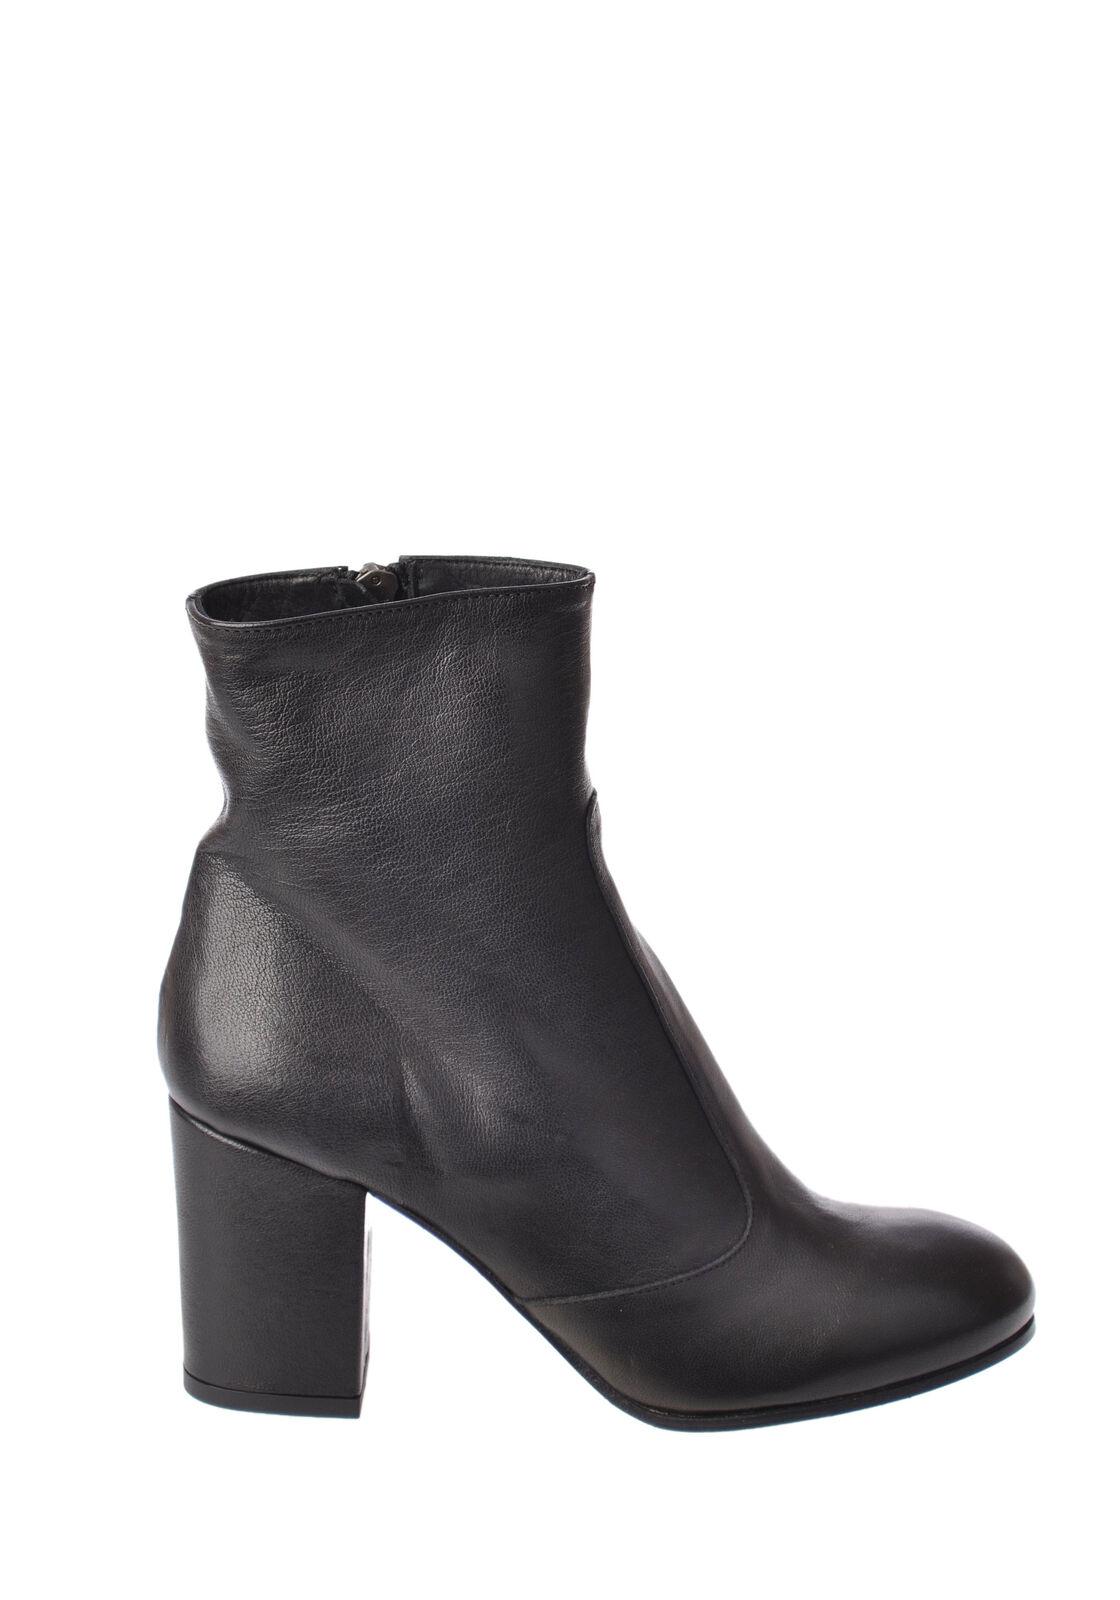 Lemarè-botas al tobillo-mujer-negro - - - 2837031N174419  de moda